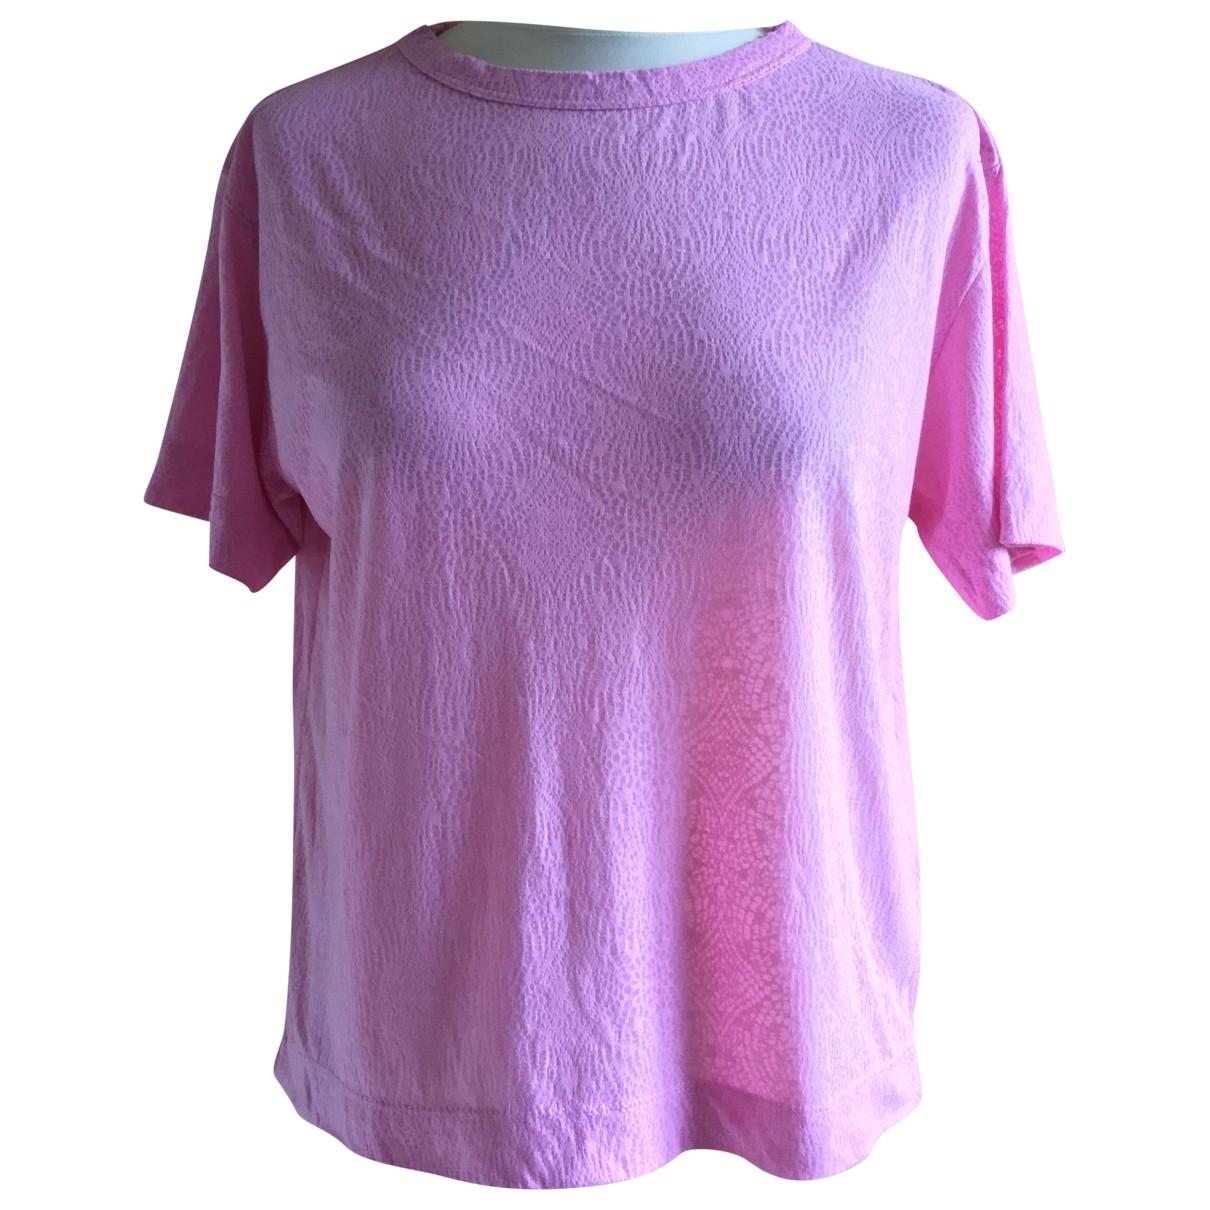 Zadig & Voltaire \N Pink  top for Women XS International